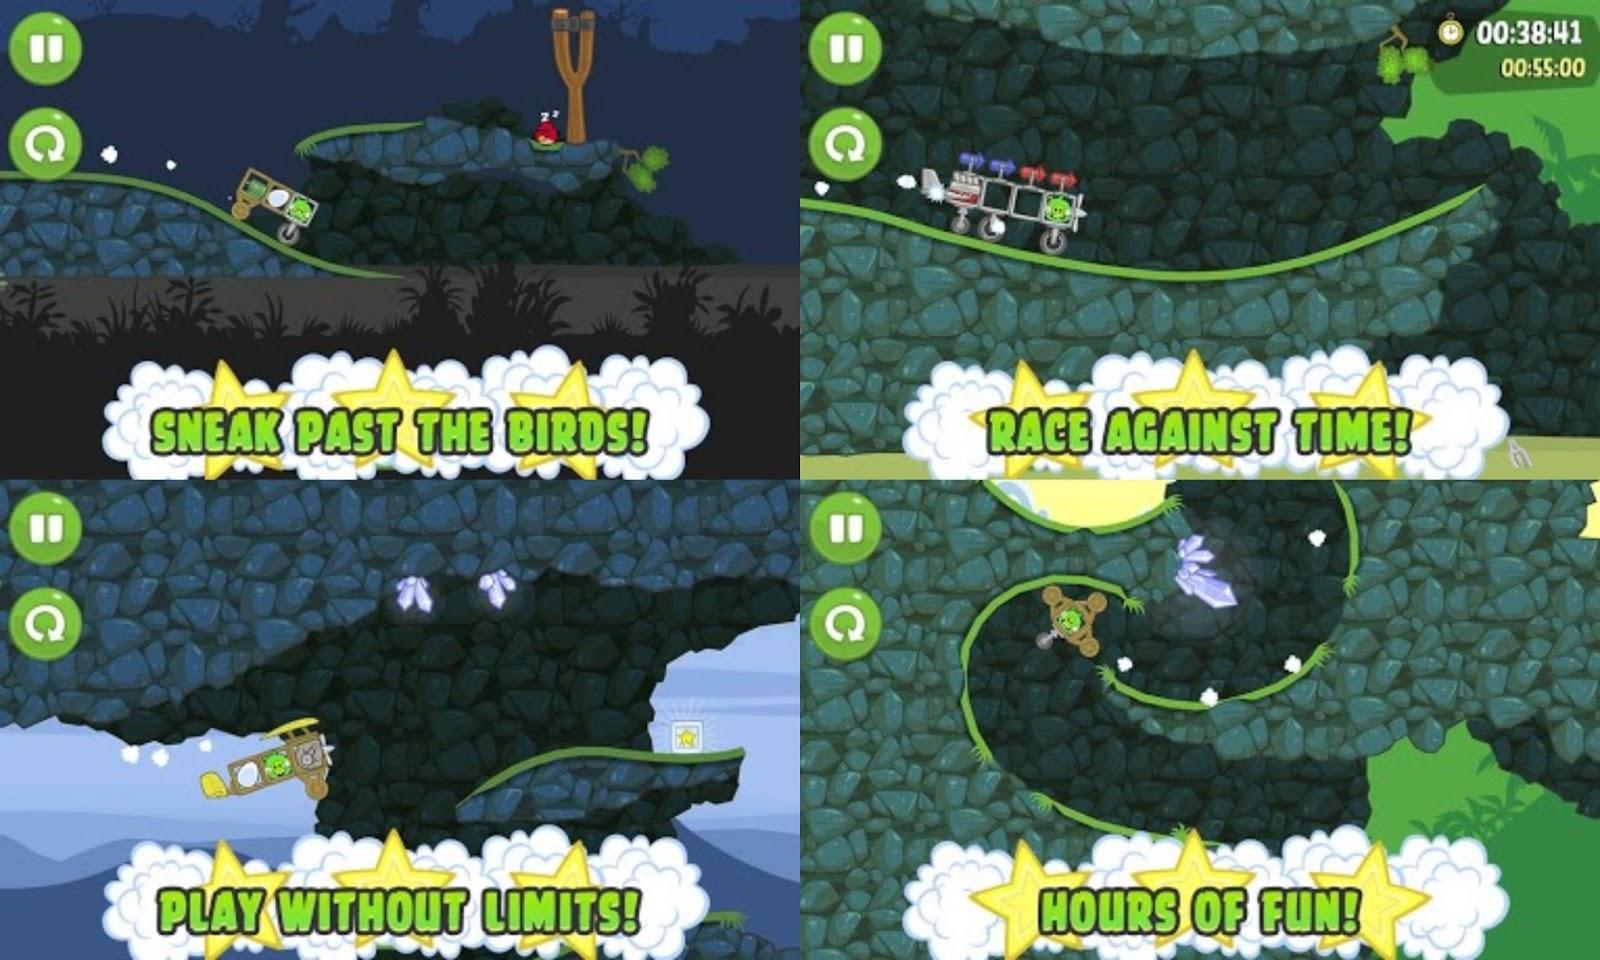 Bad Piggies HD v1.1.0 Apk | Android Games Download